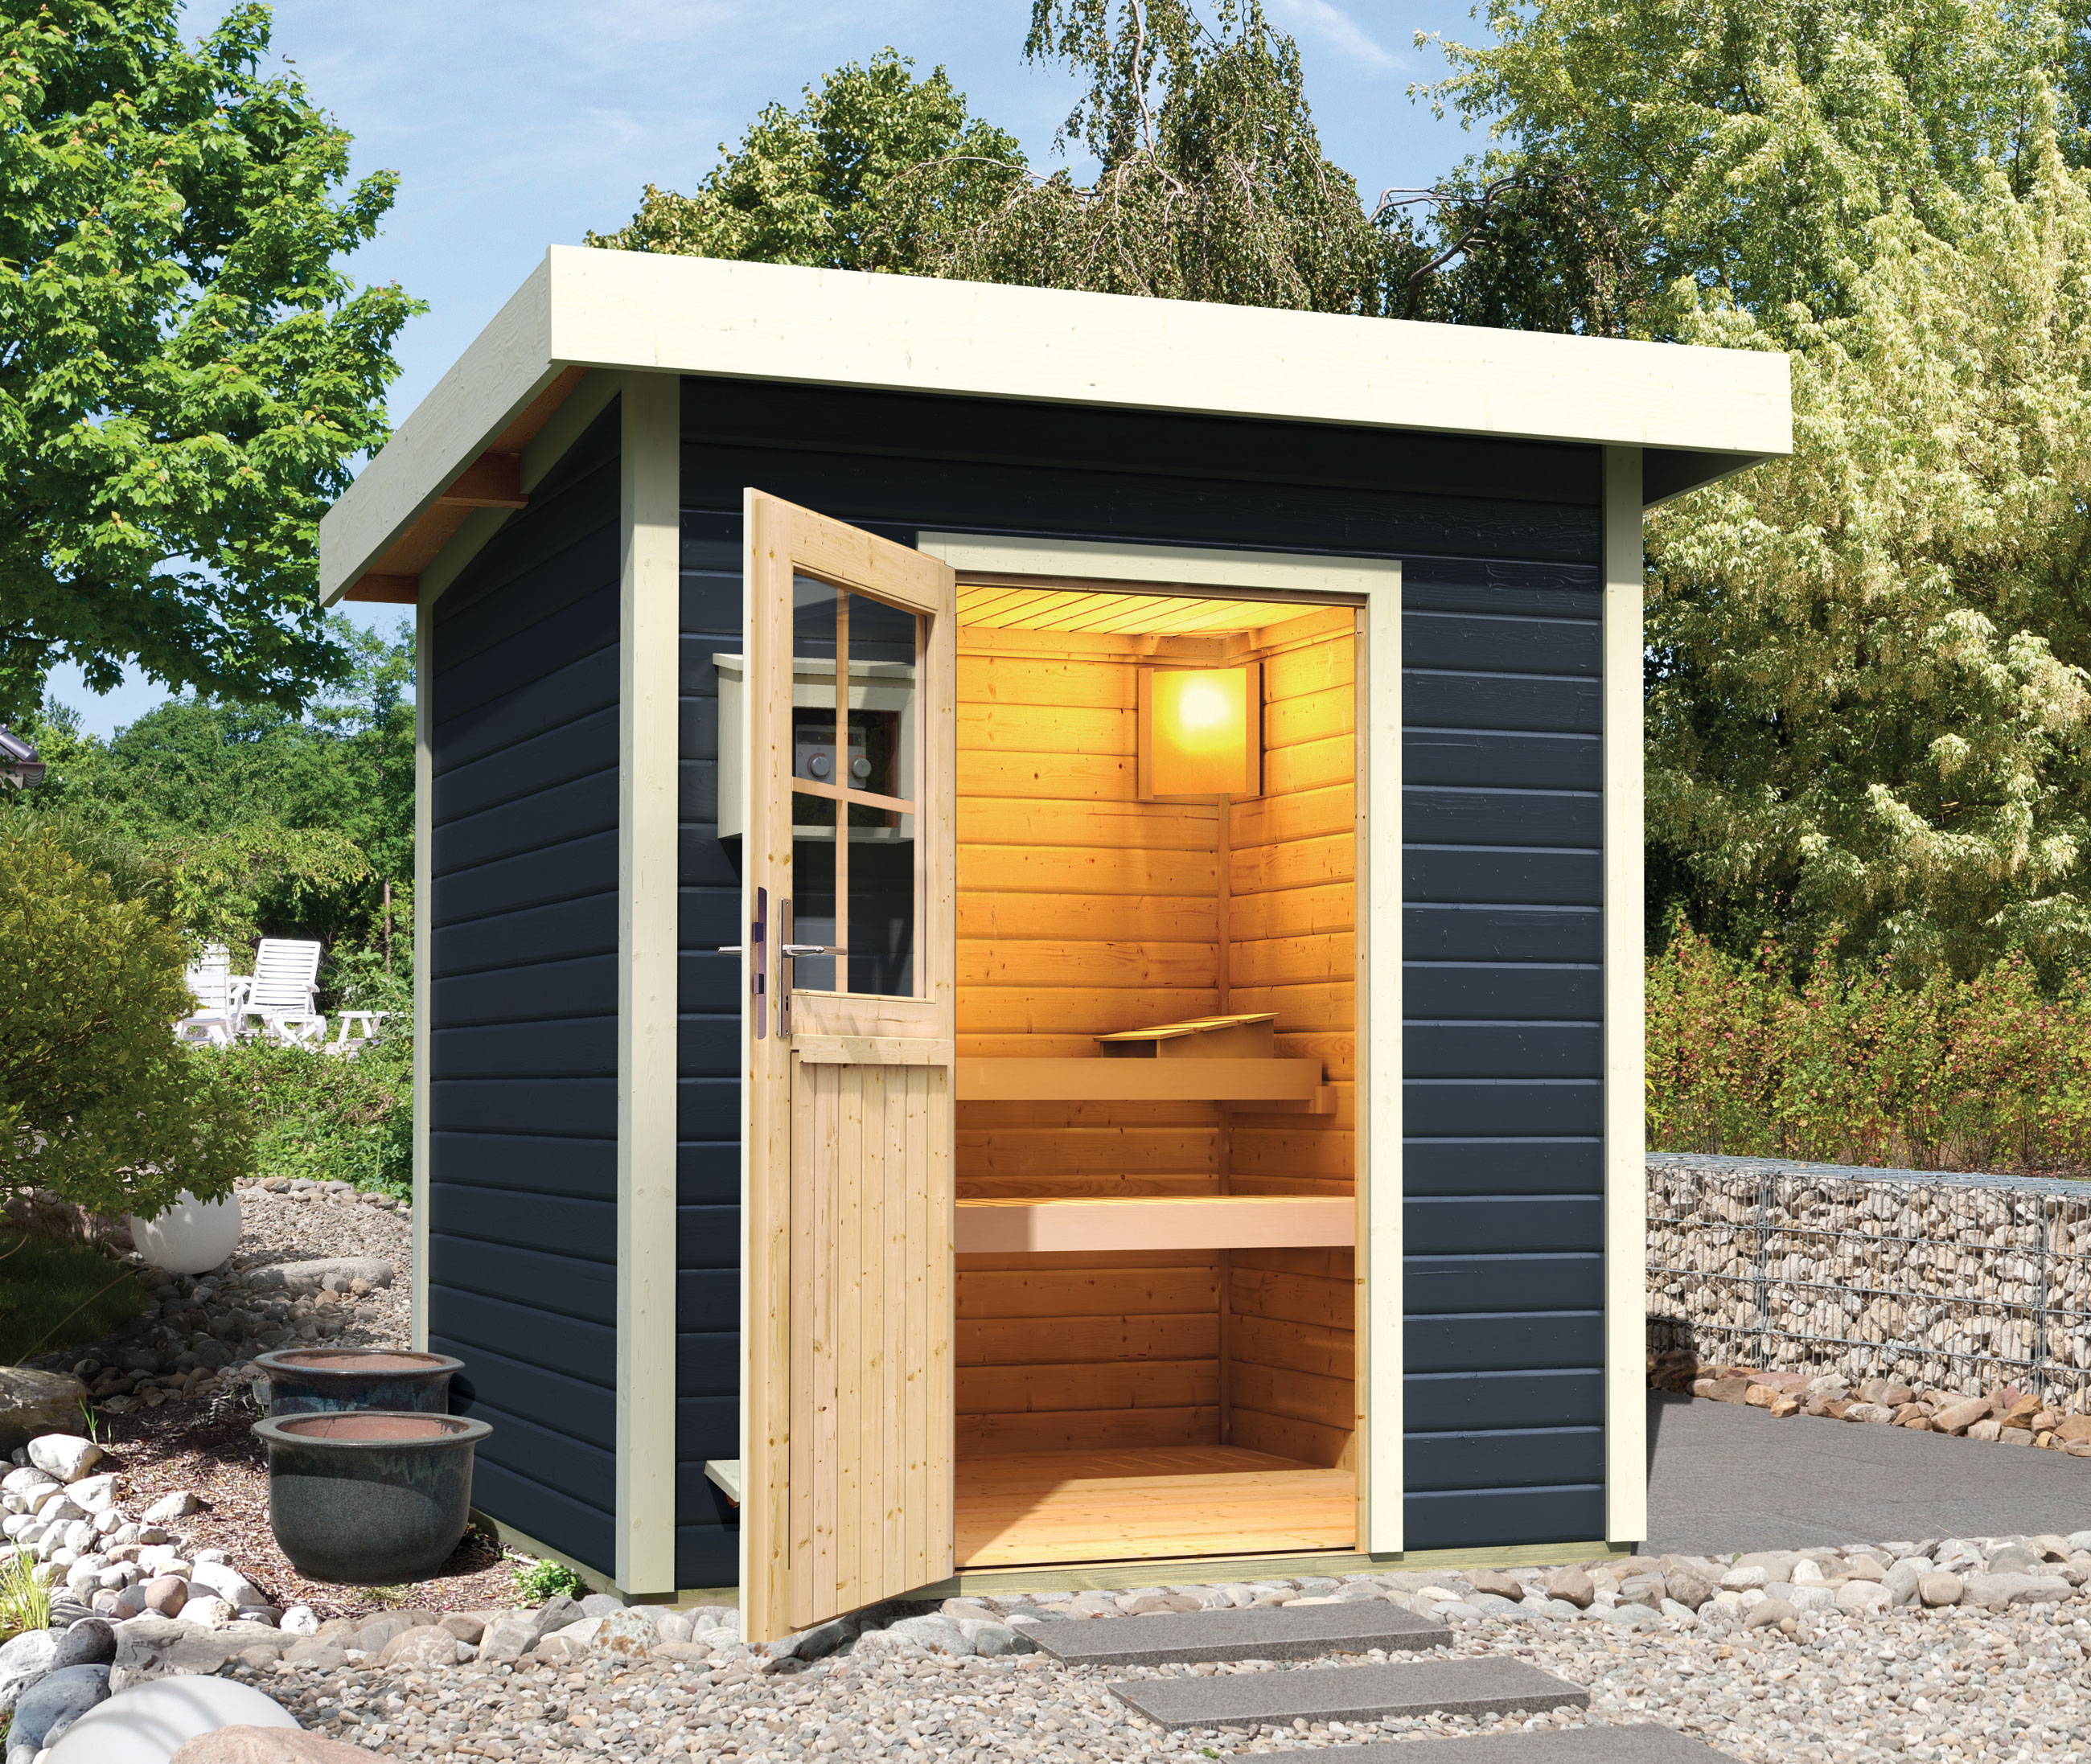 gartensauna mit ofen bo44 kyushucon. Black Bedroom Furniture Sets. Home Design Ideas